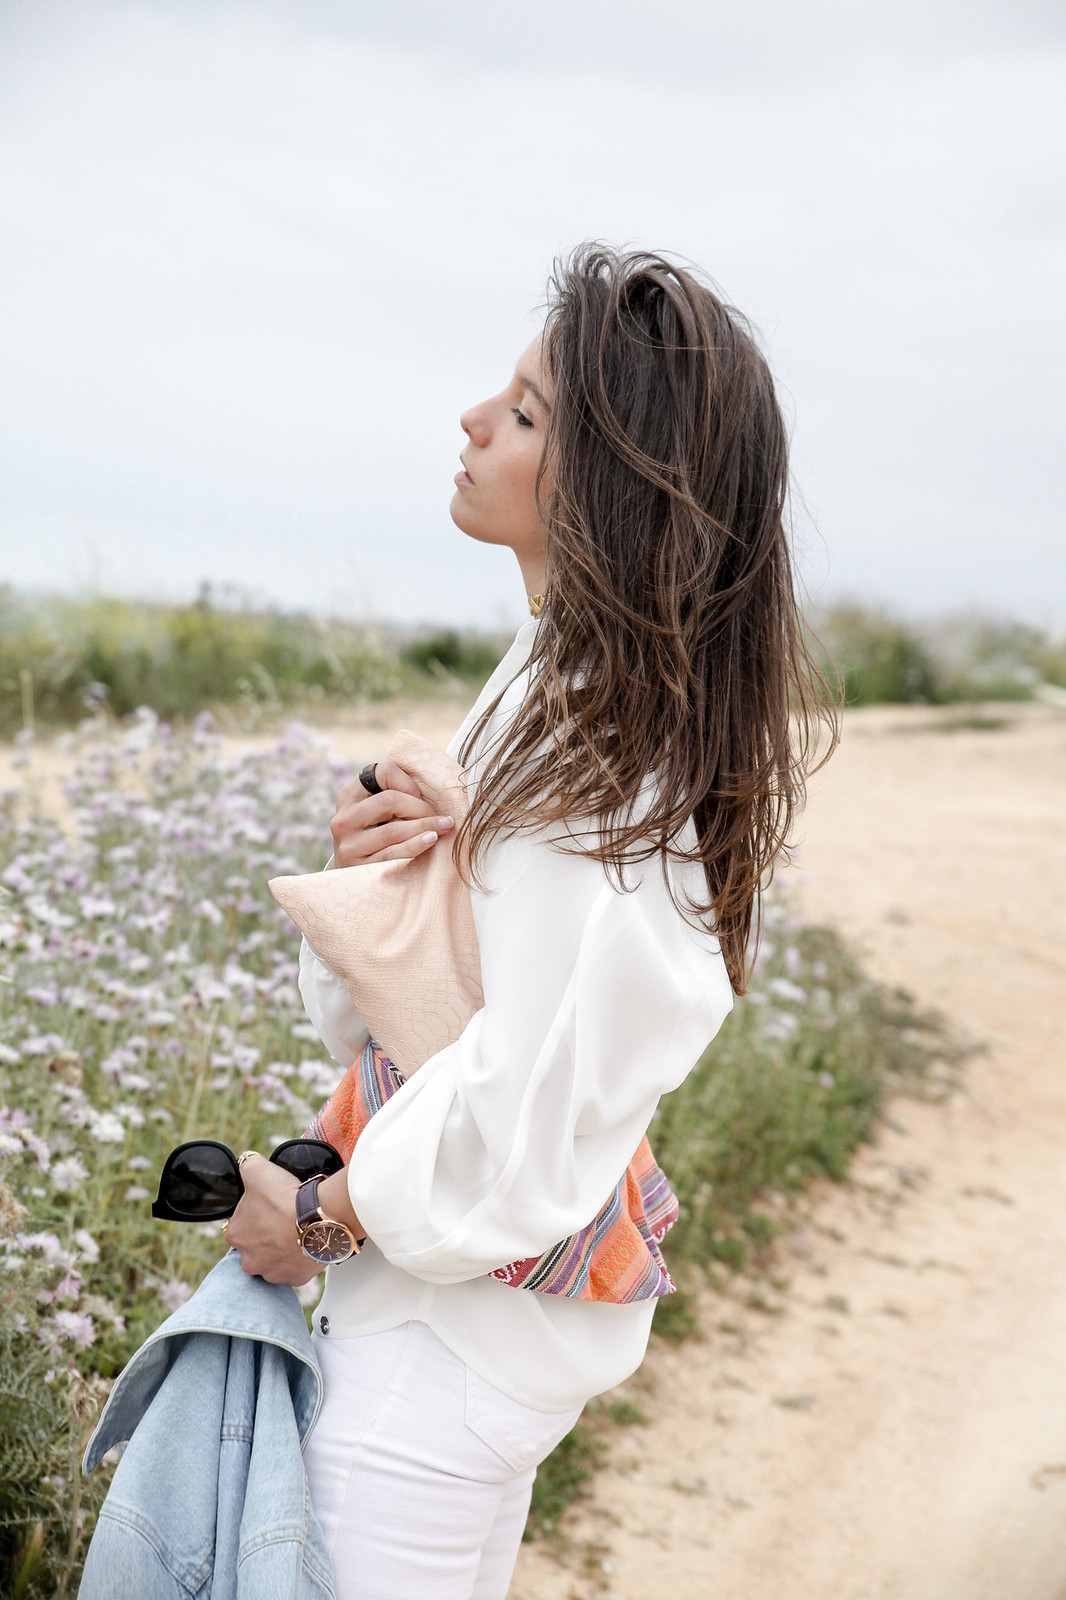 013_corset_etnico_danity_paris_theguestgirl_influencer_barcelona_laura_santolaria